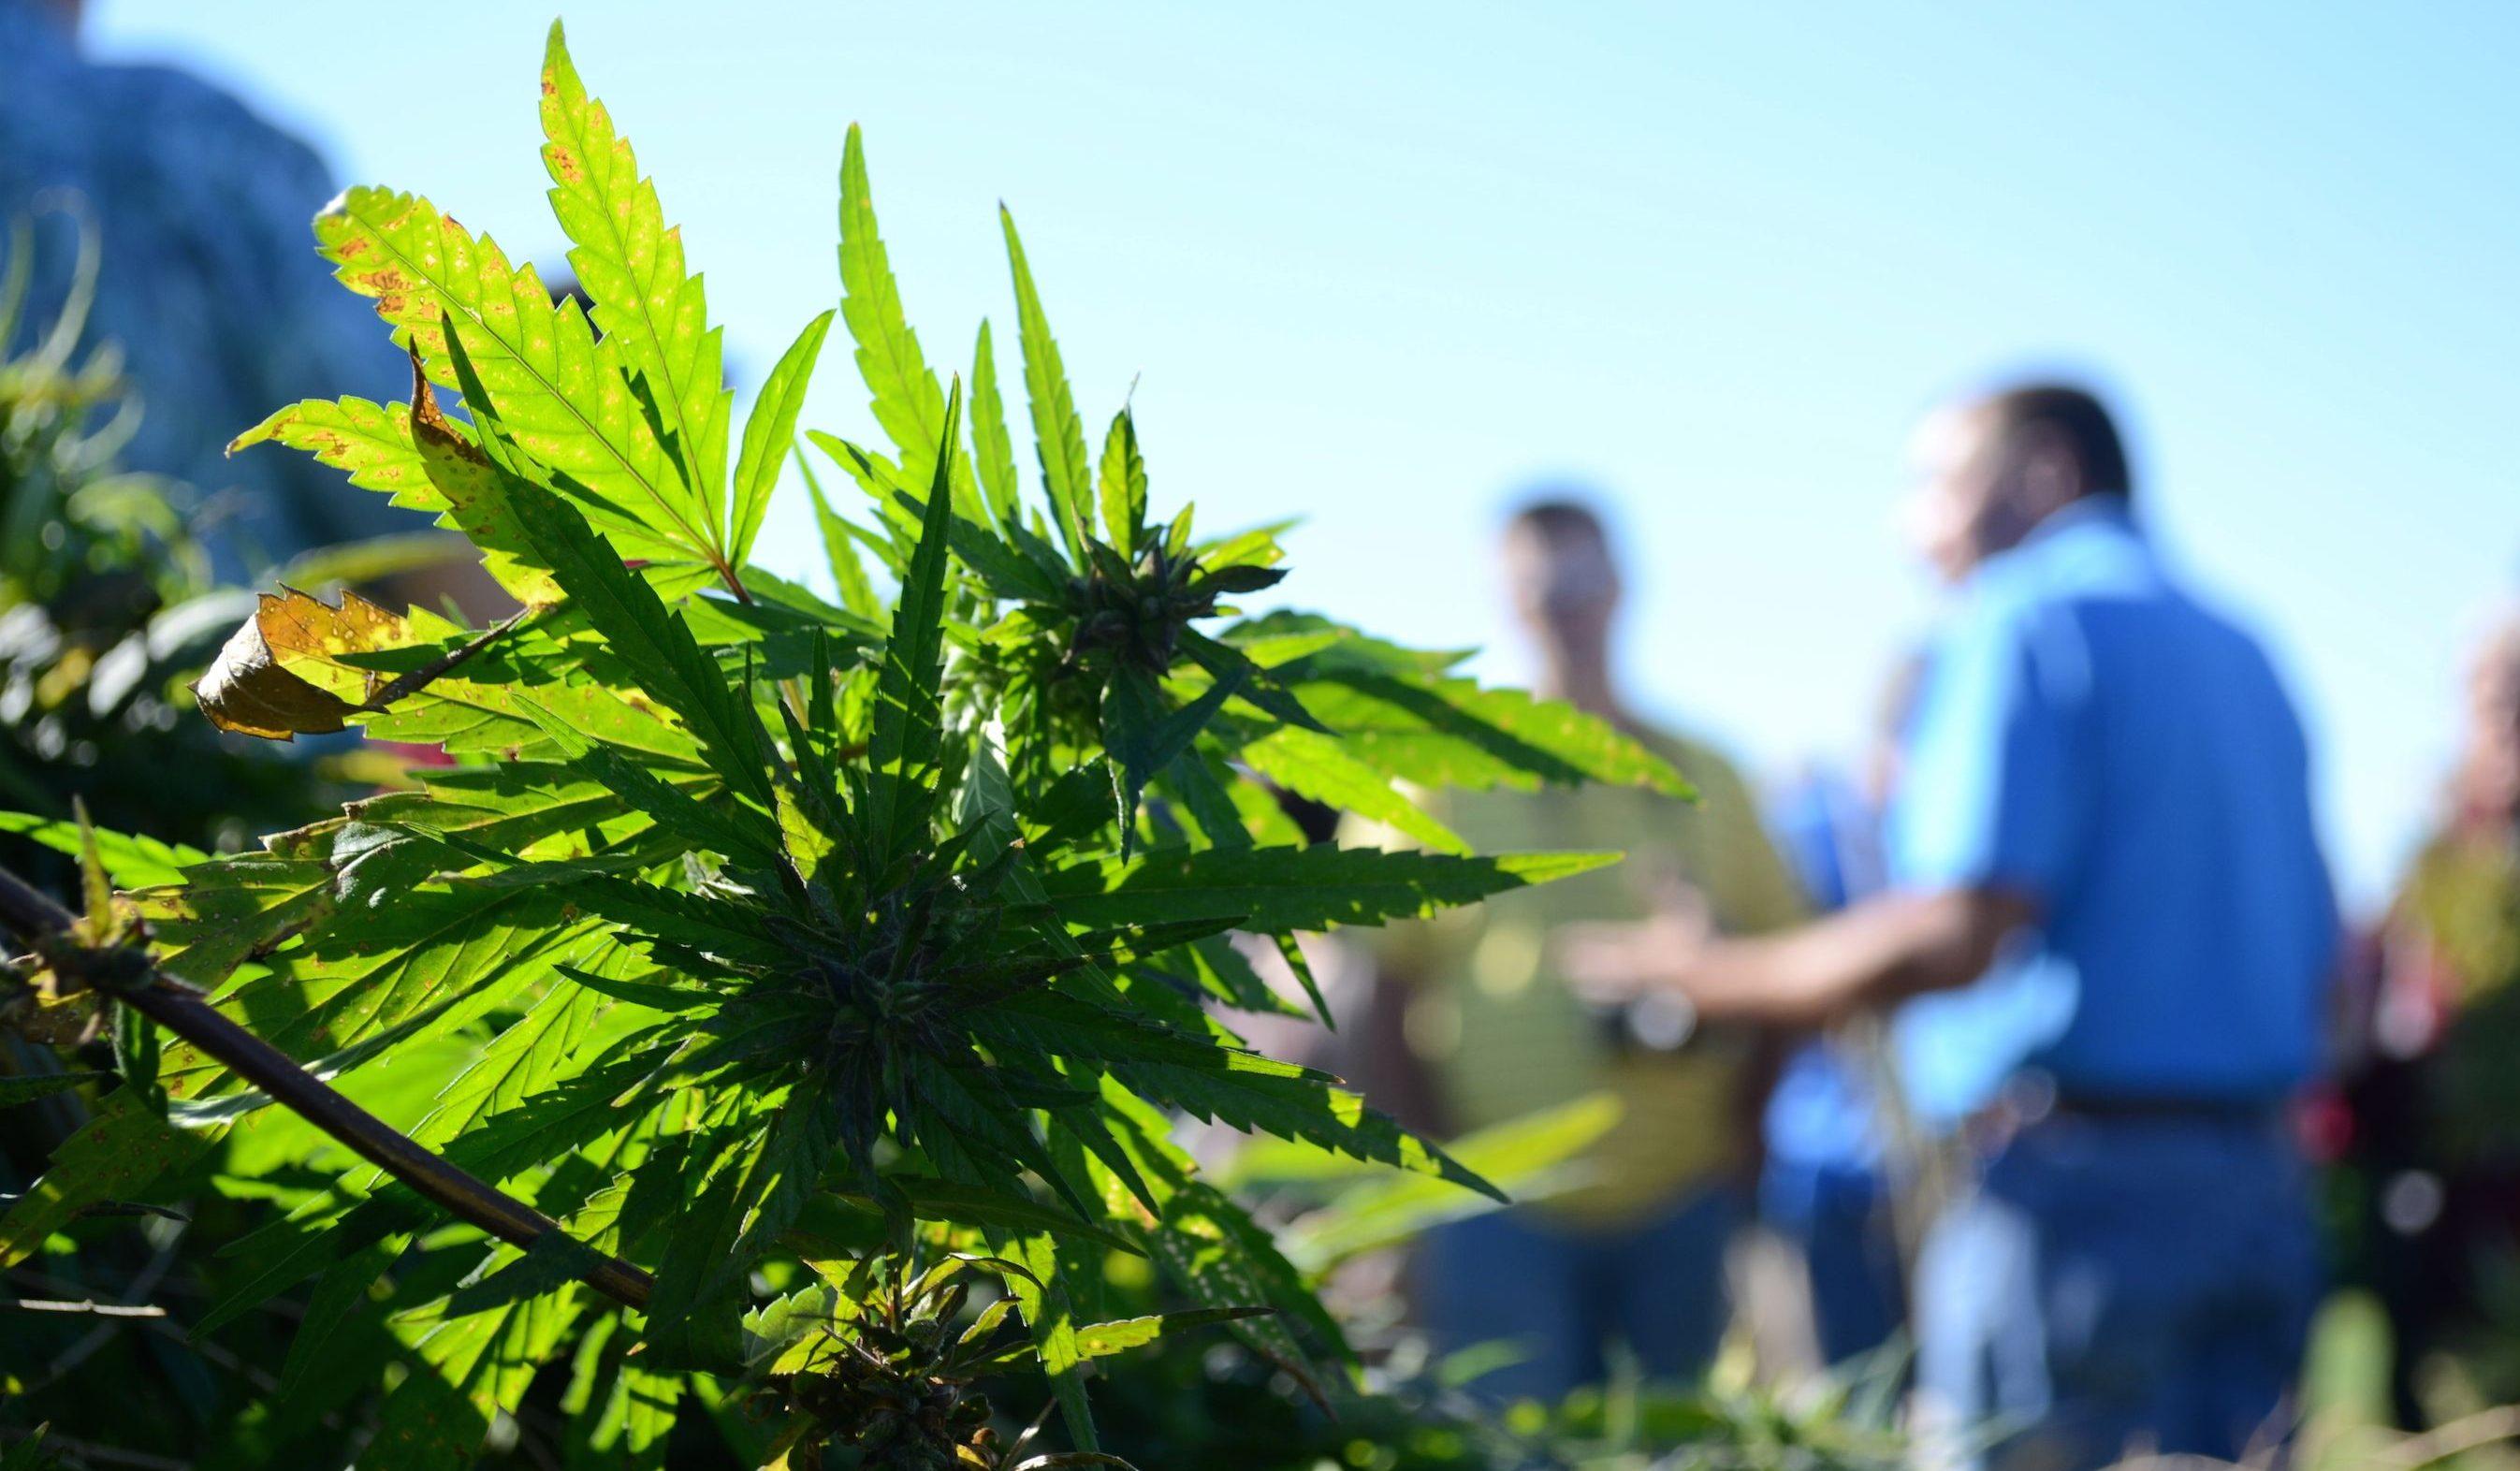 The 2018 Farm Bill could make hemp the next tobacco — Quartz